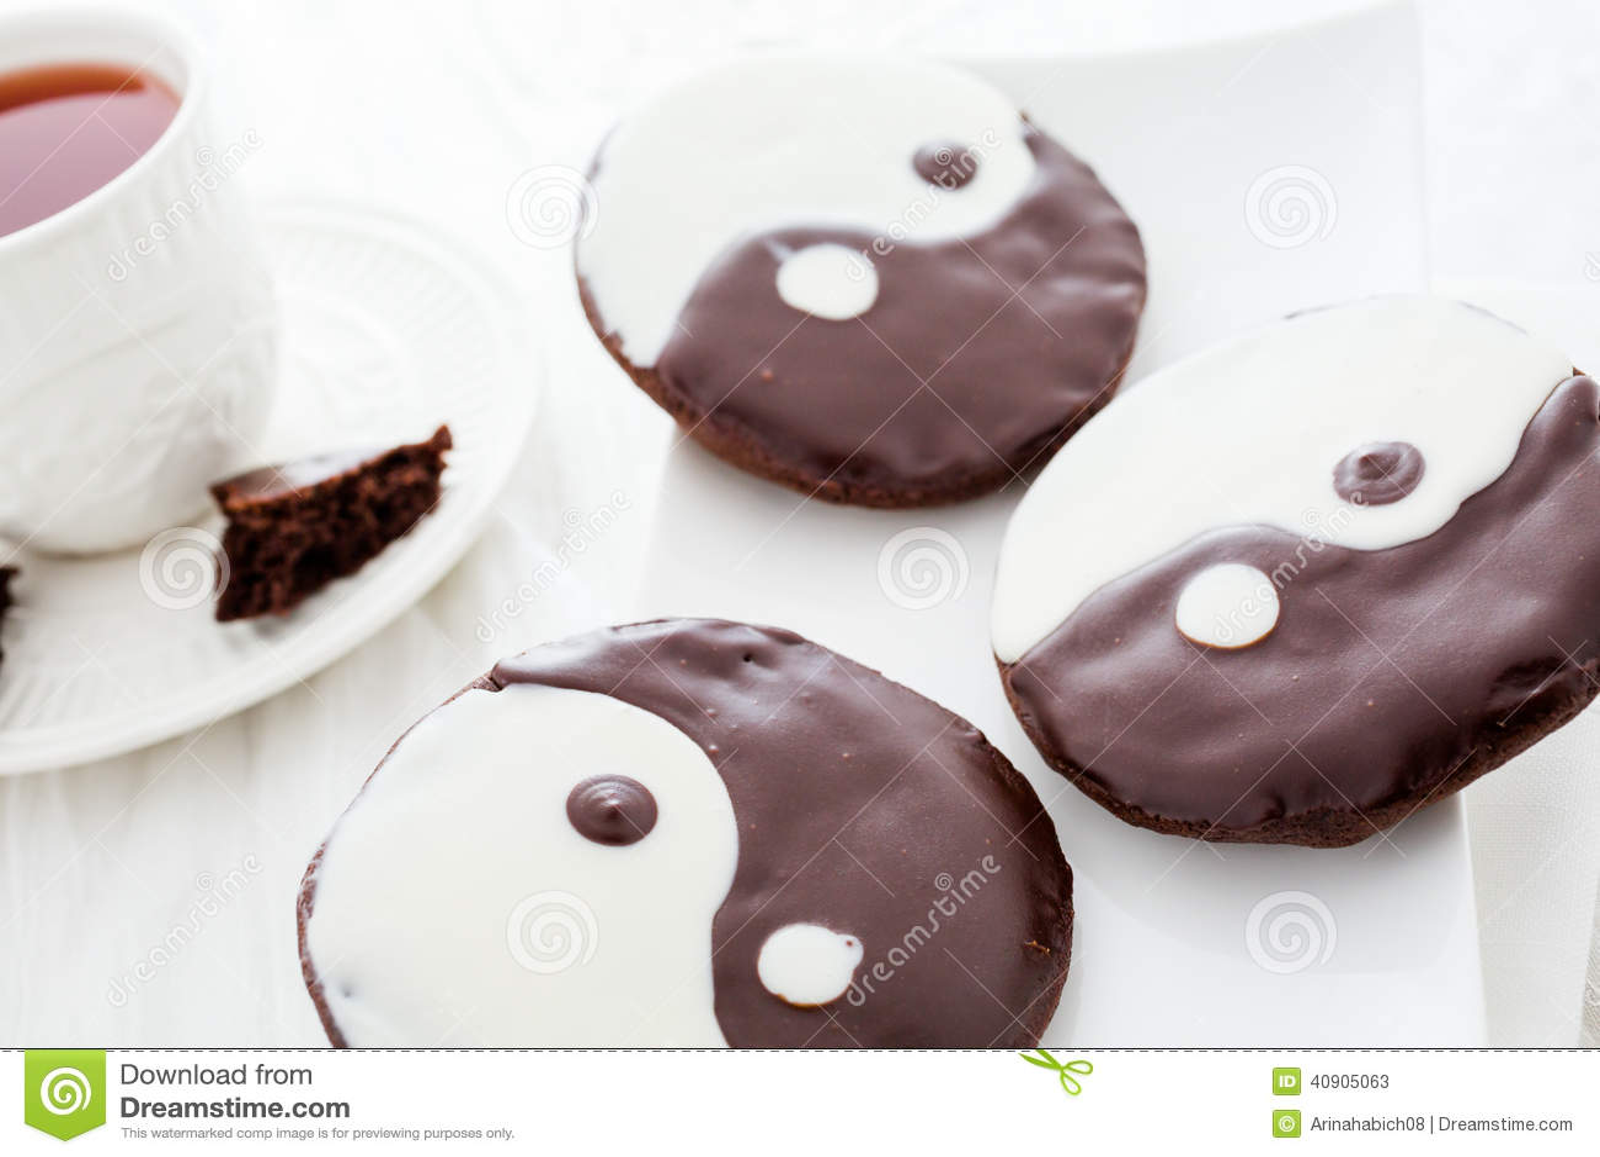 Yin and yang cookies